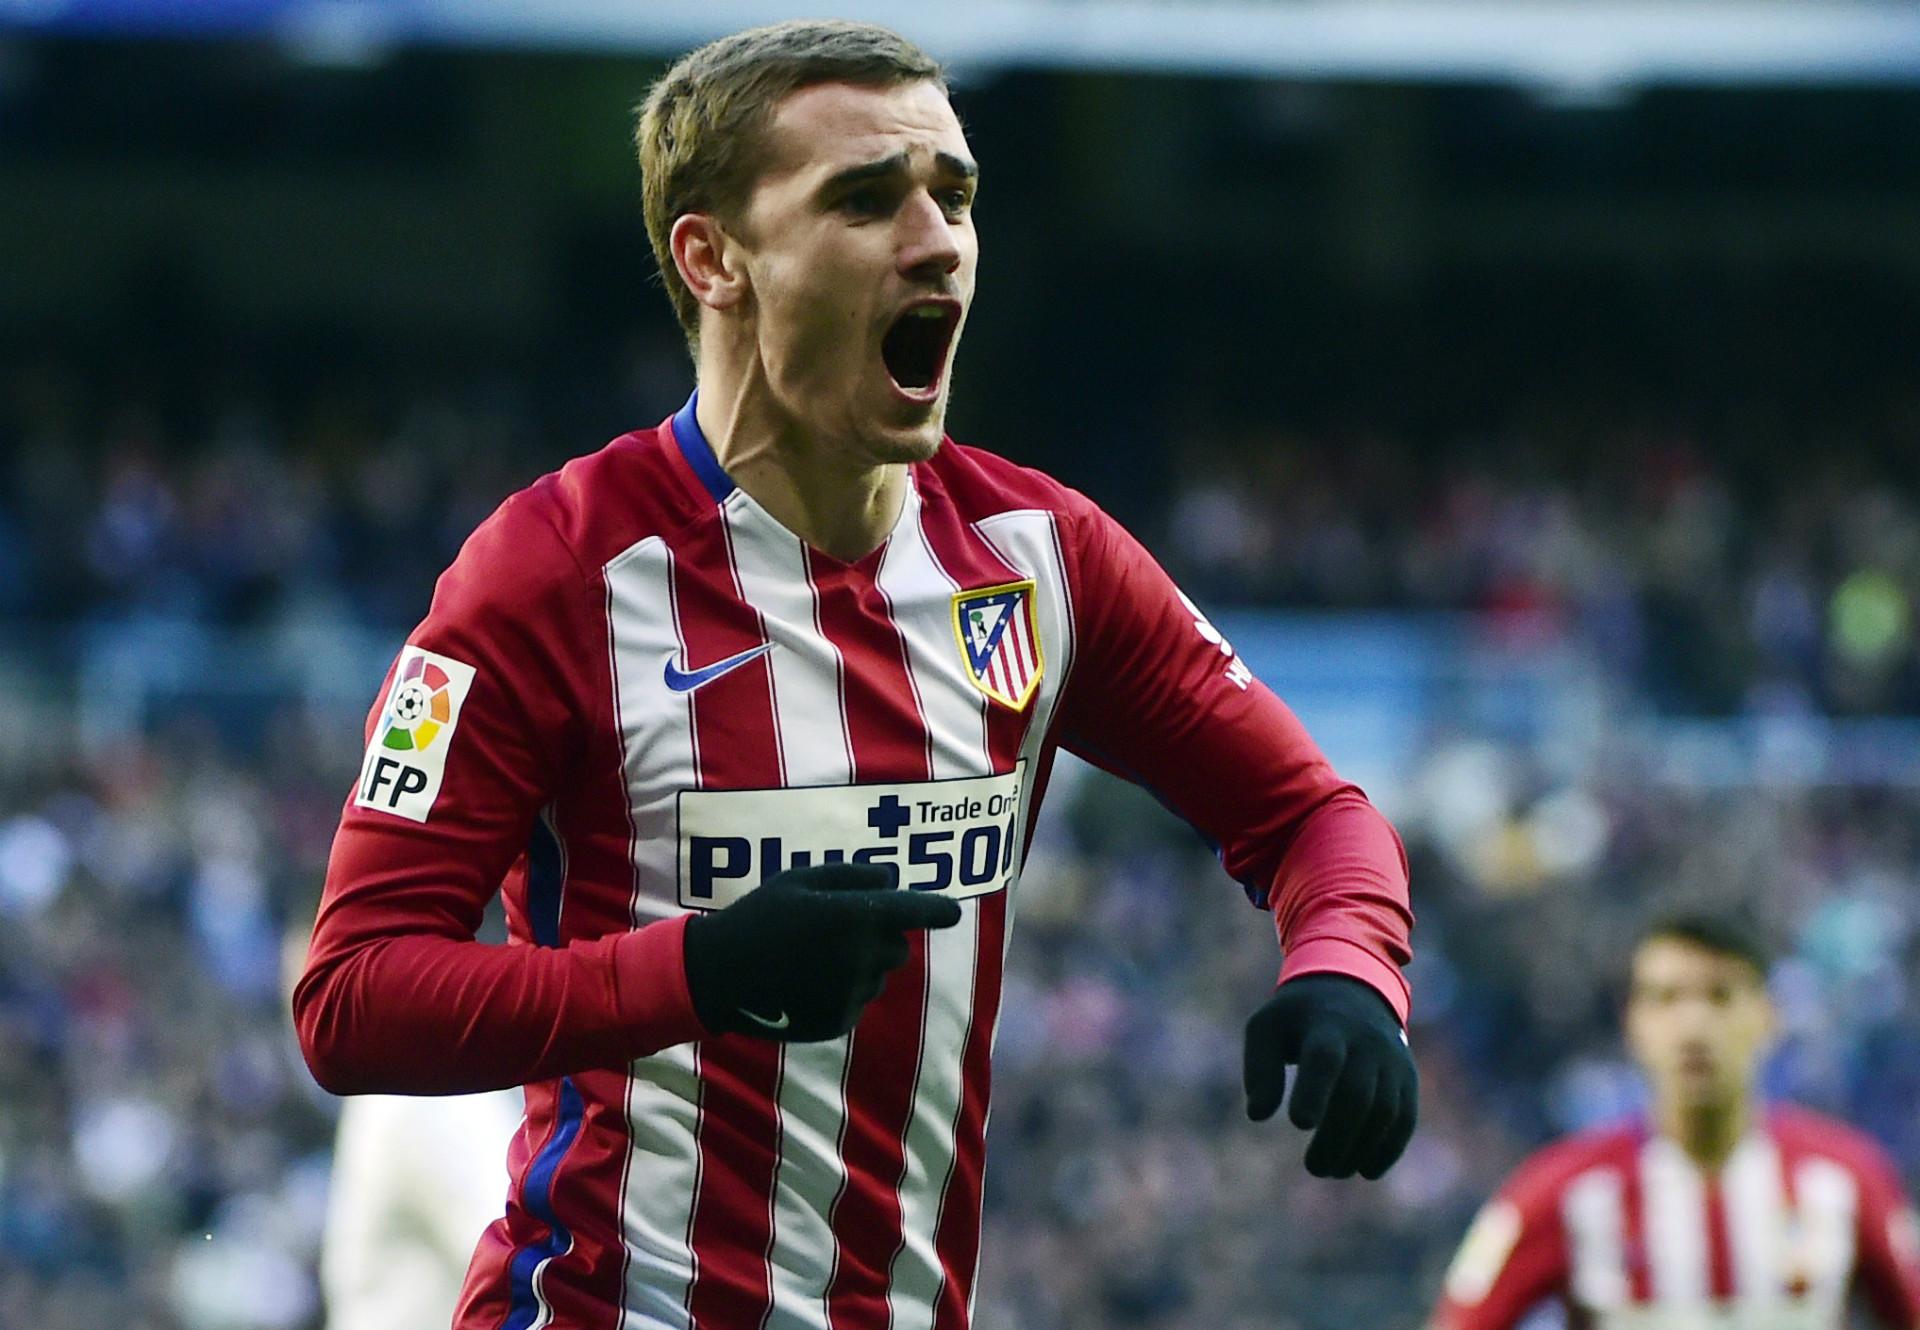 La Liga: Spanish Football: Who Is La Liga's Player Of The Year